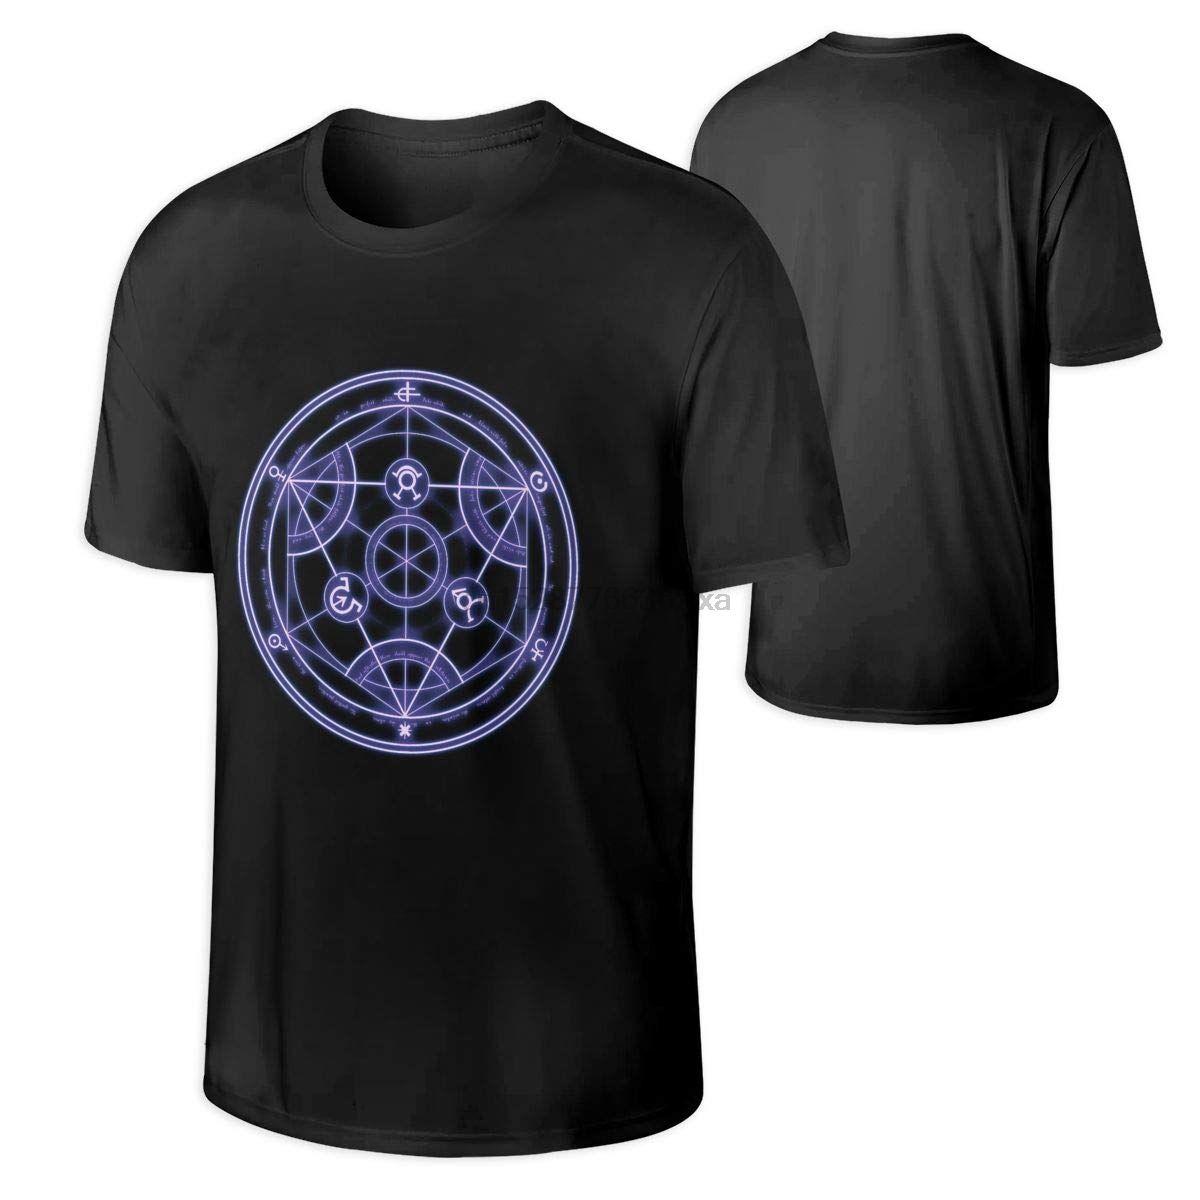 Fullmetal Alchemist Mens Anime Camisetas